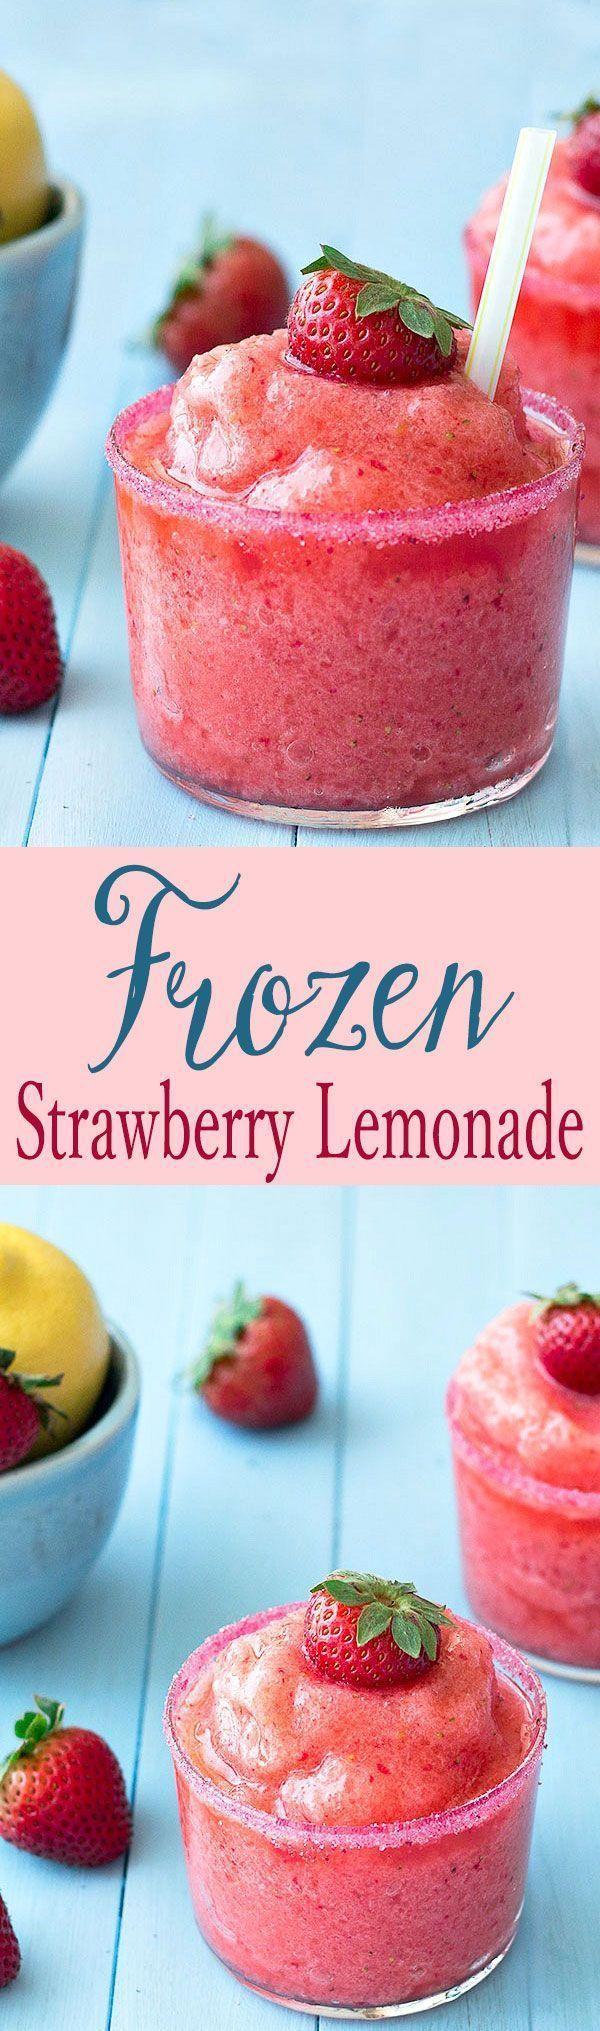 Frozen Strawberry Lemonade - So easy to make, full of fresh strawberries and tart lemons. Not too sour or too sweet, just perfect!